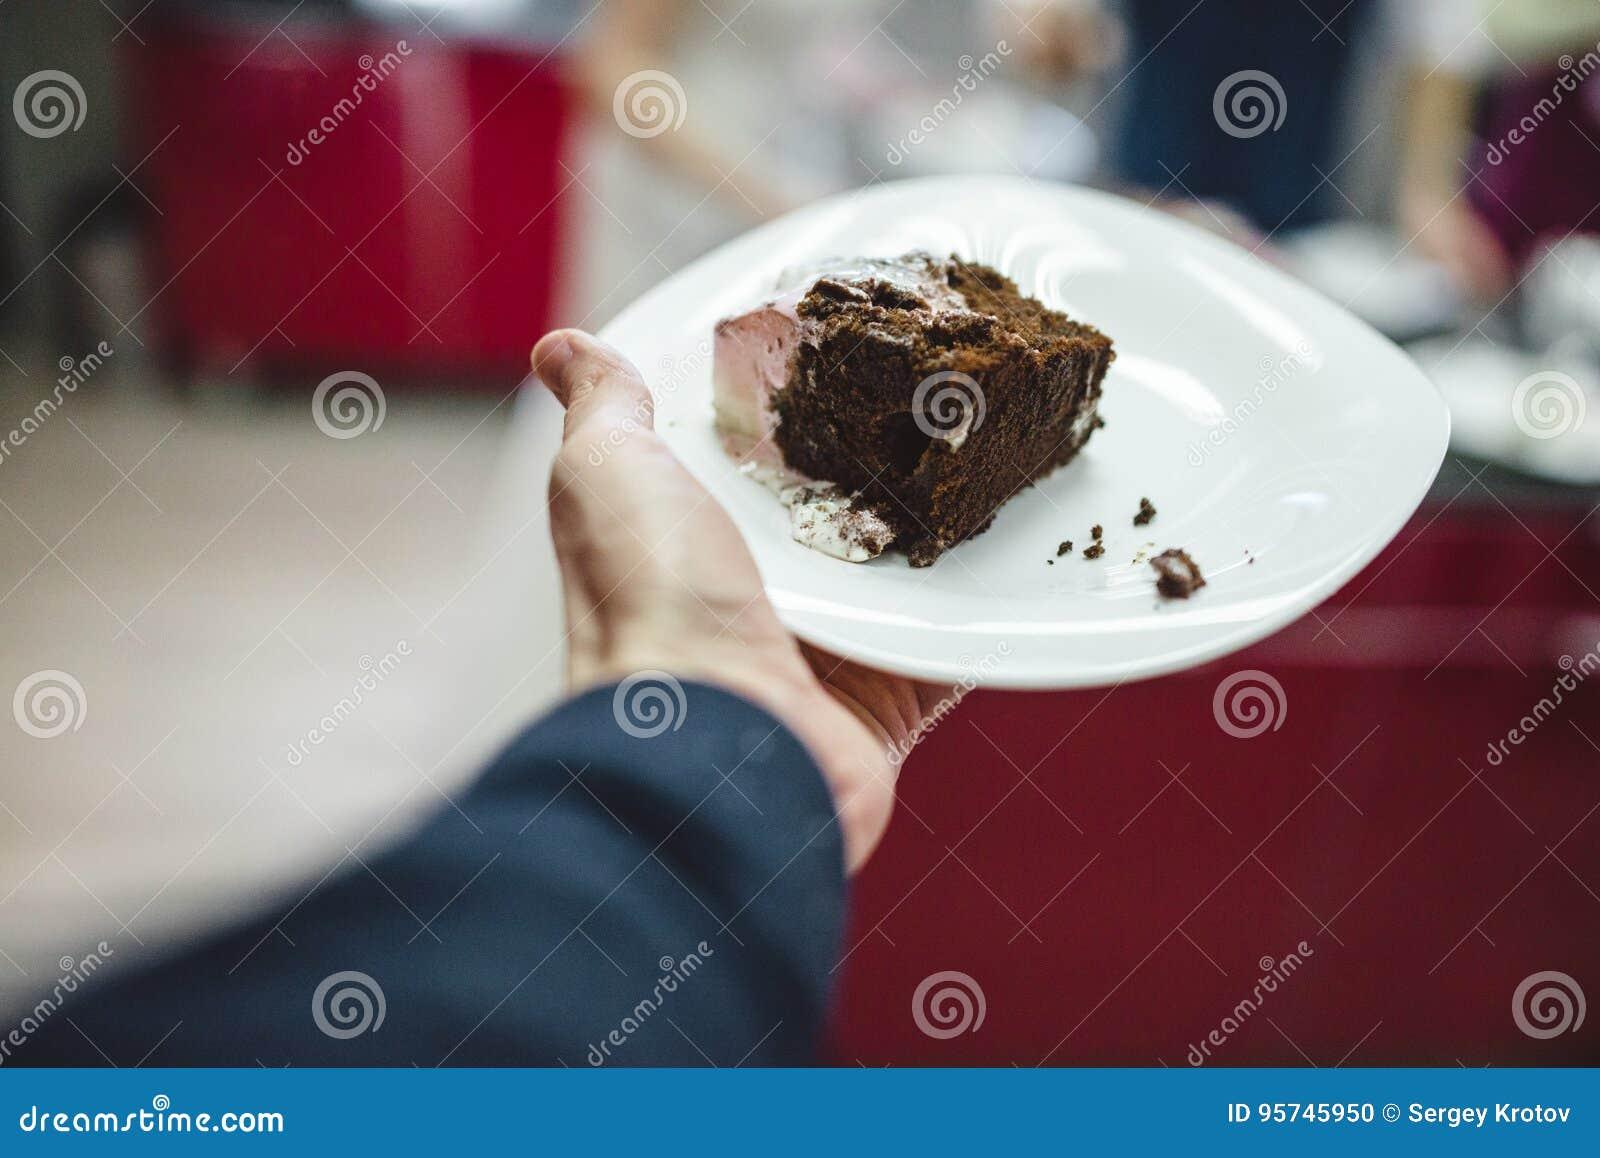 Men S Hand Holding Slice Of Glazed Chocolate Wedding Cake On The